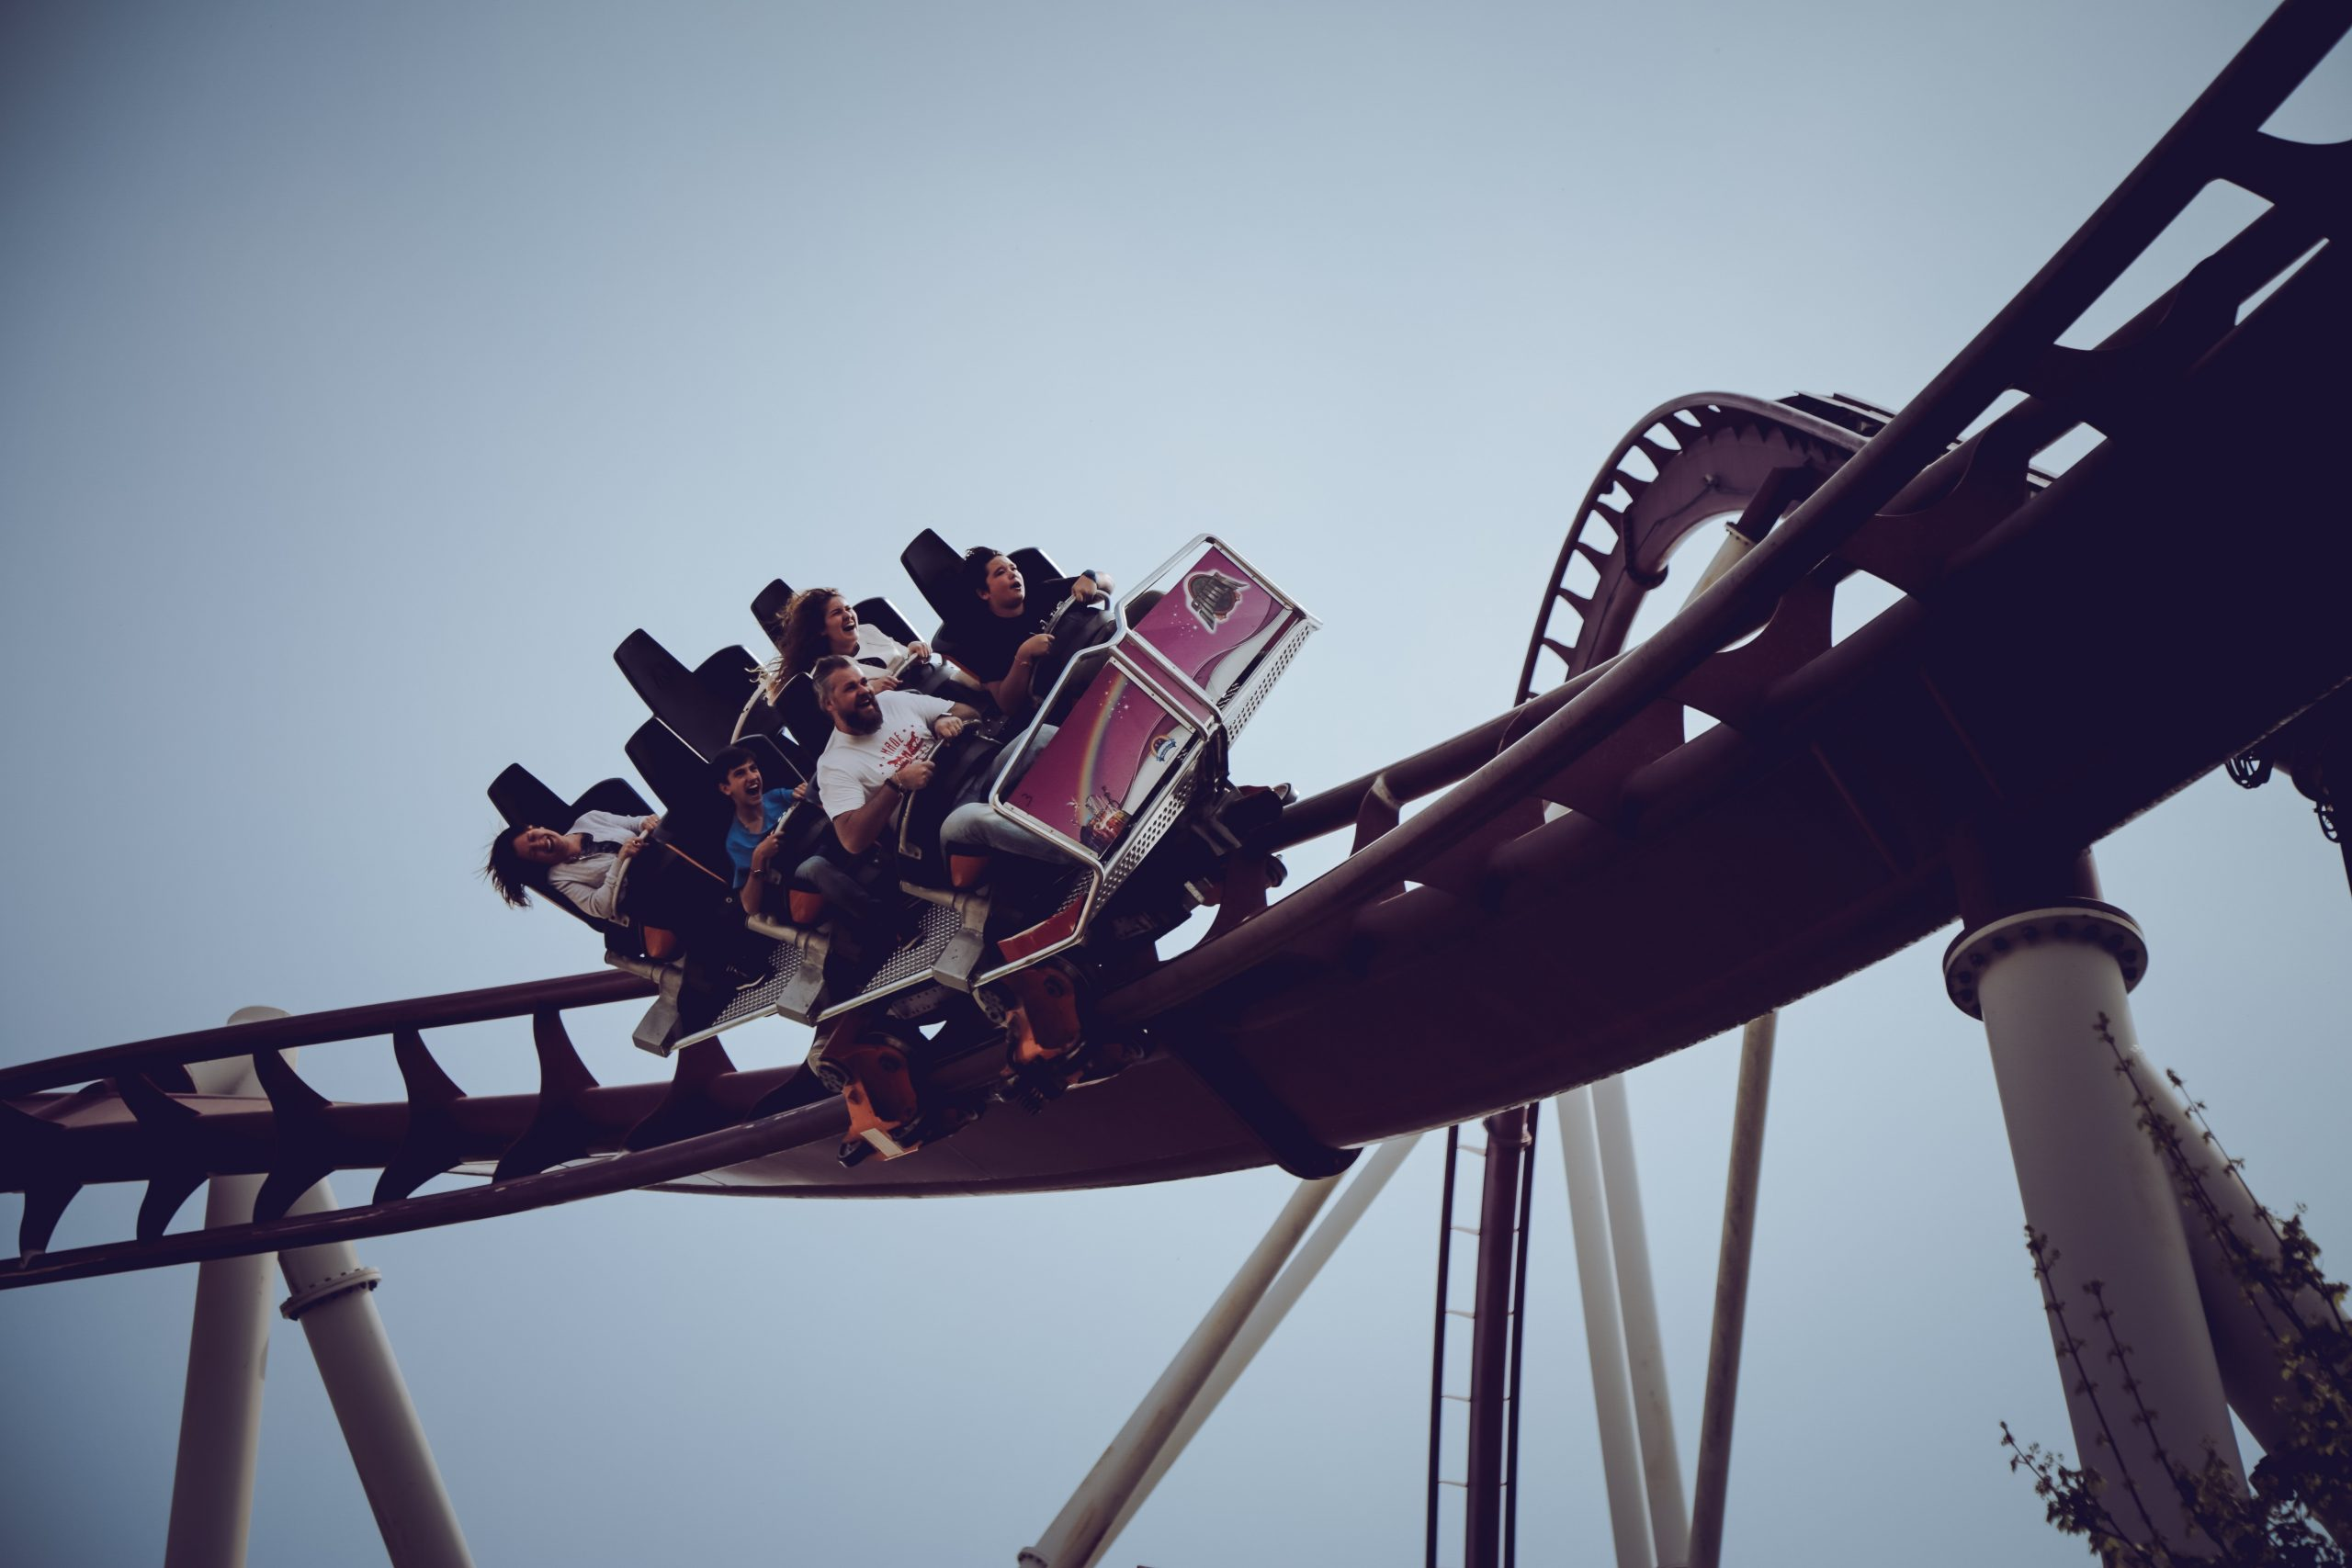 wallpaper Roller coaster at daytime